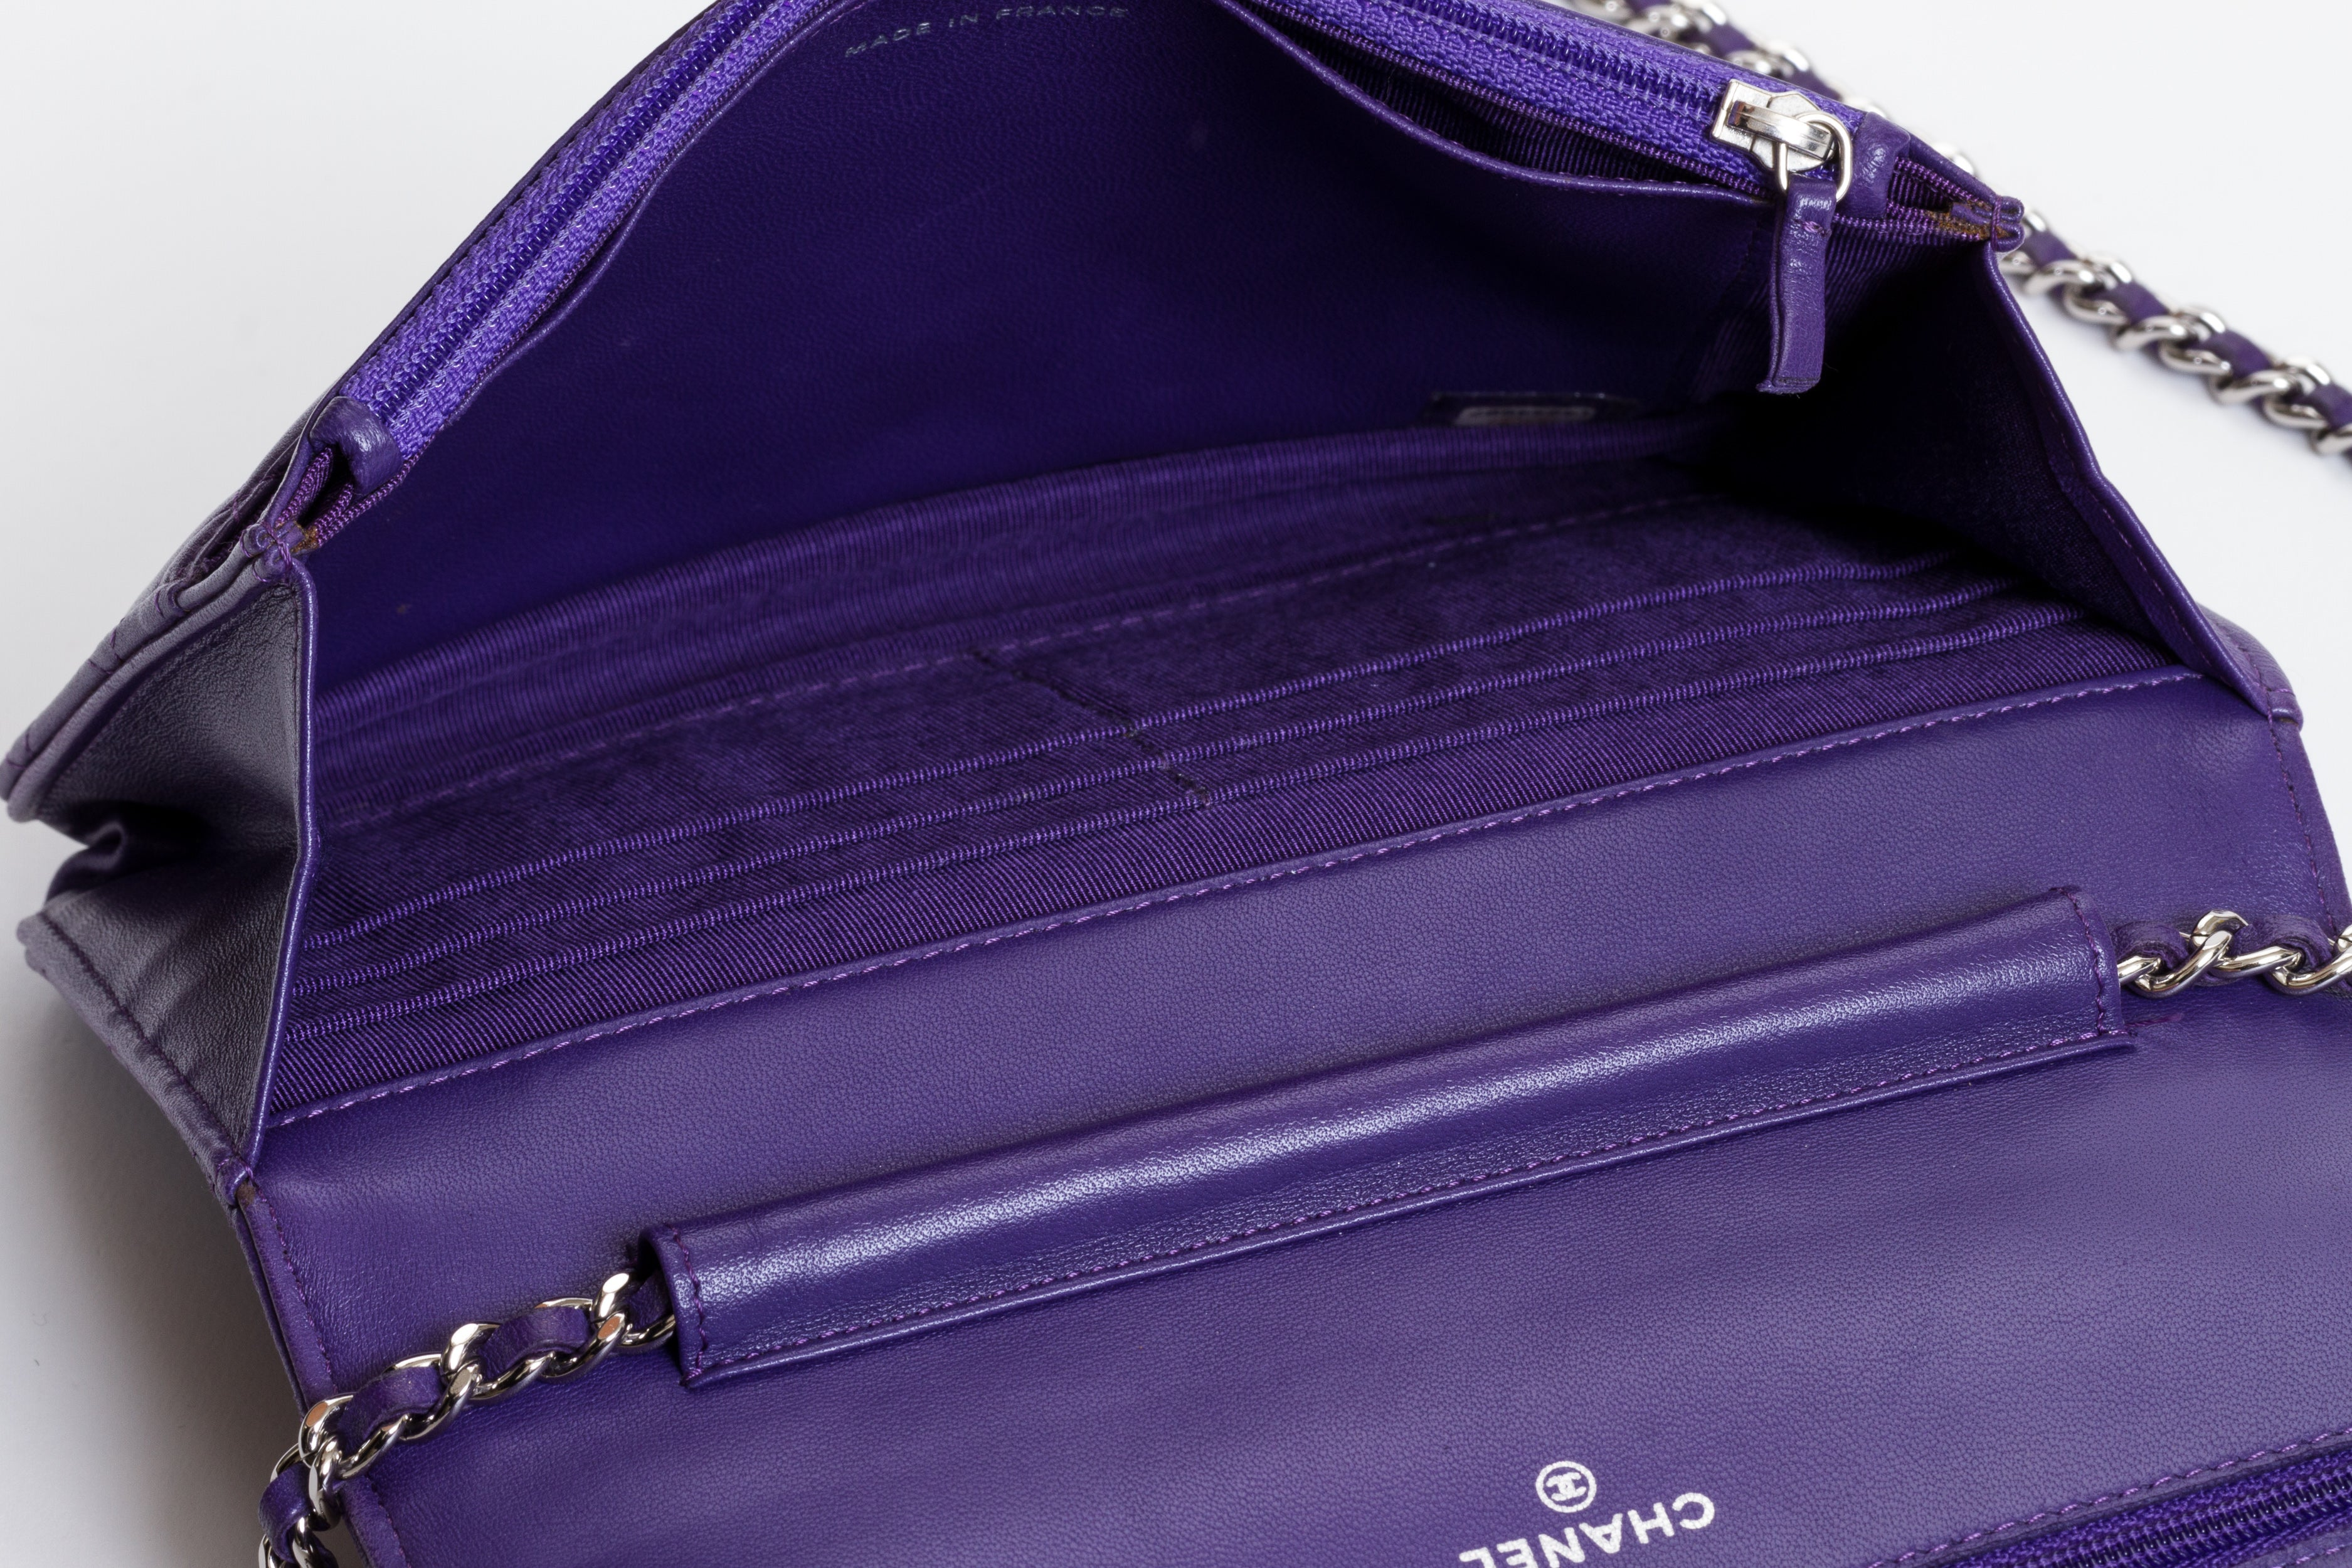 cda9d513acffa Chanel Neuauflage Lila Handtasche an einer Kette bei 1stdibs